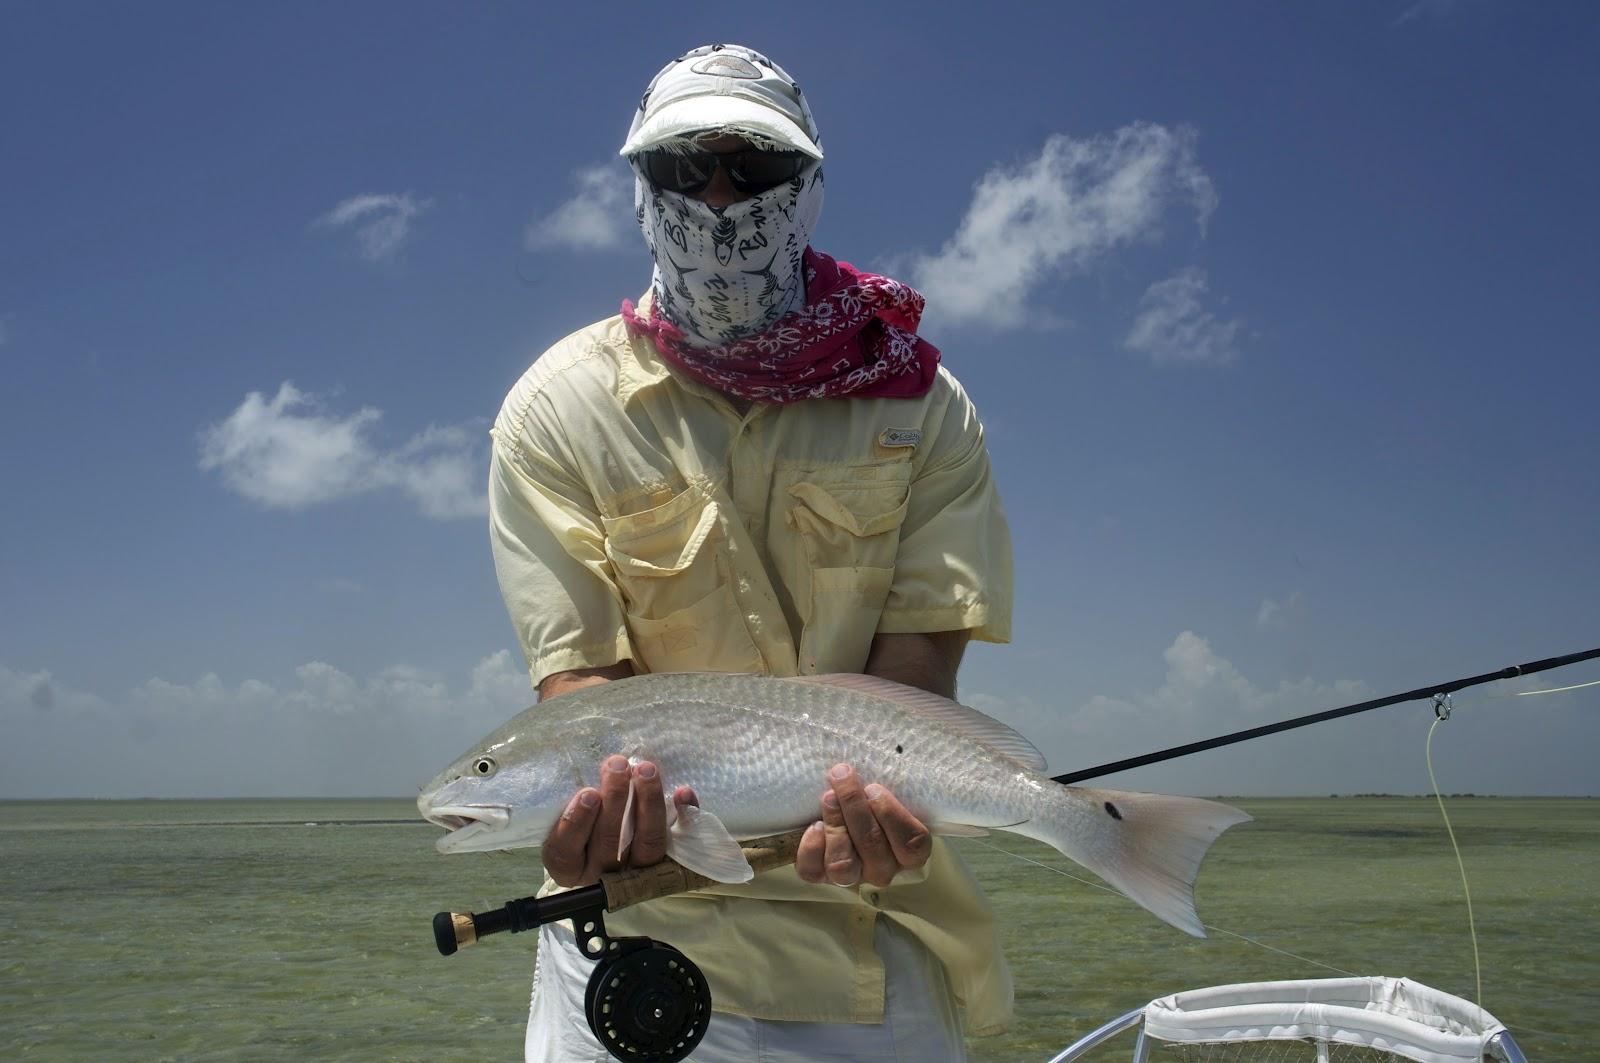 Captain scott sparrow 39 s blog enchanted morning for Arroyo city fishing